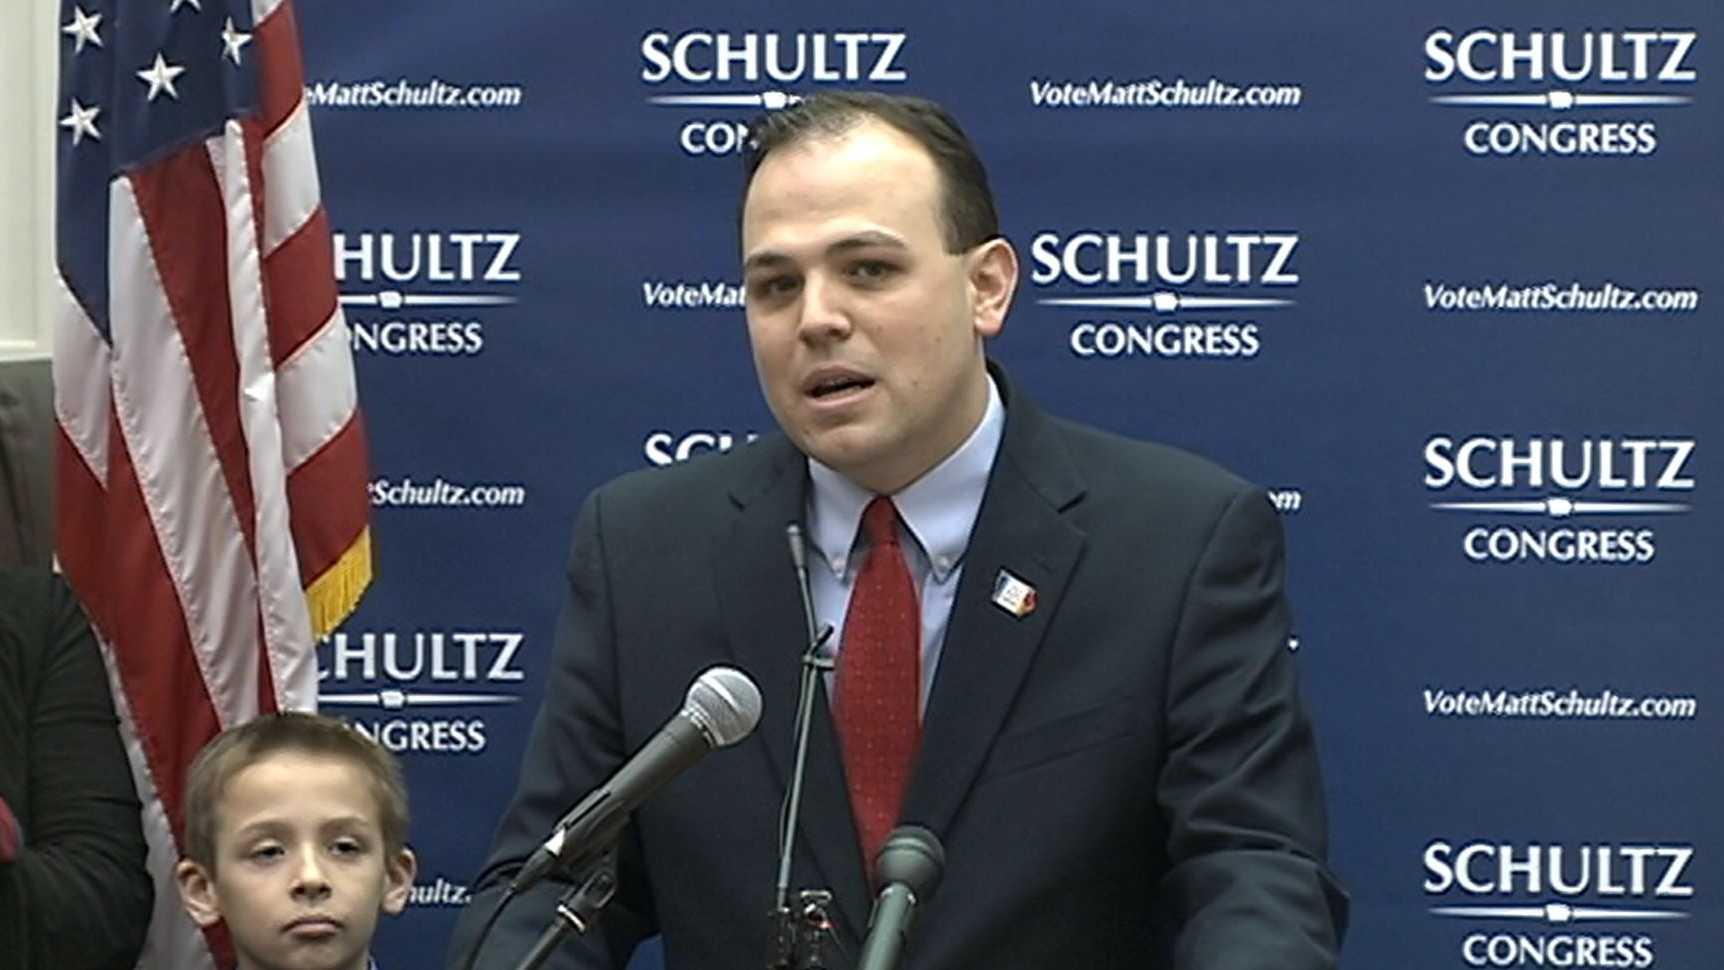 Matt Schultz campaign announcement